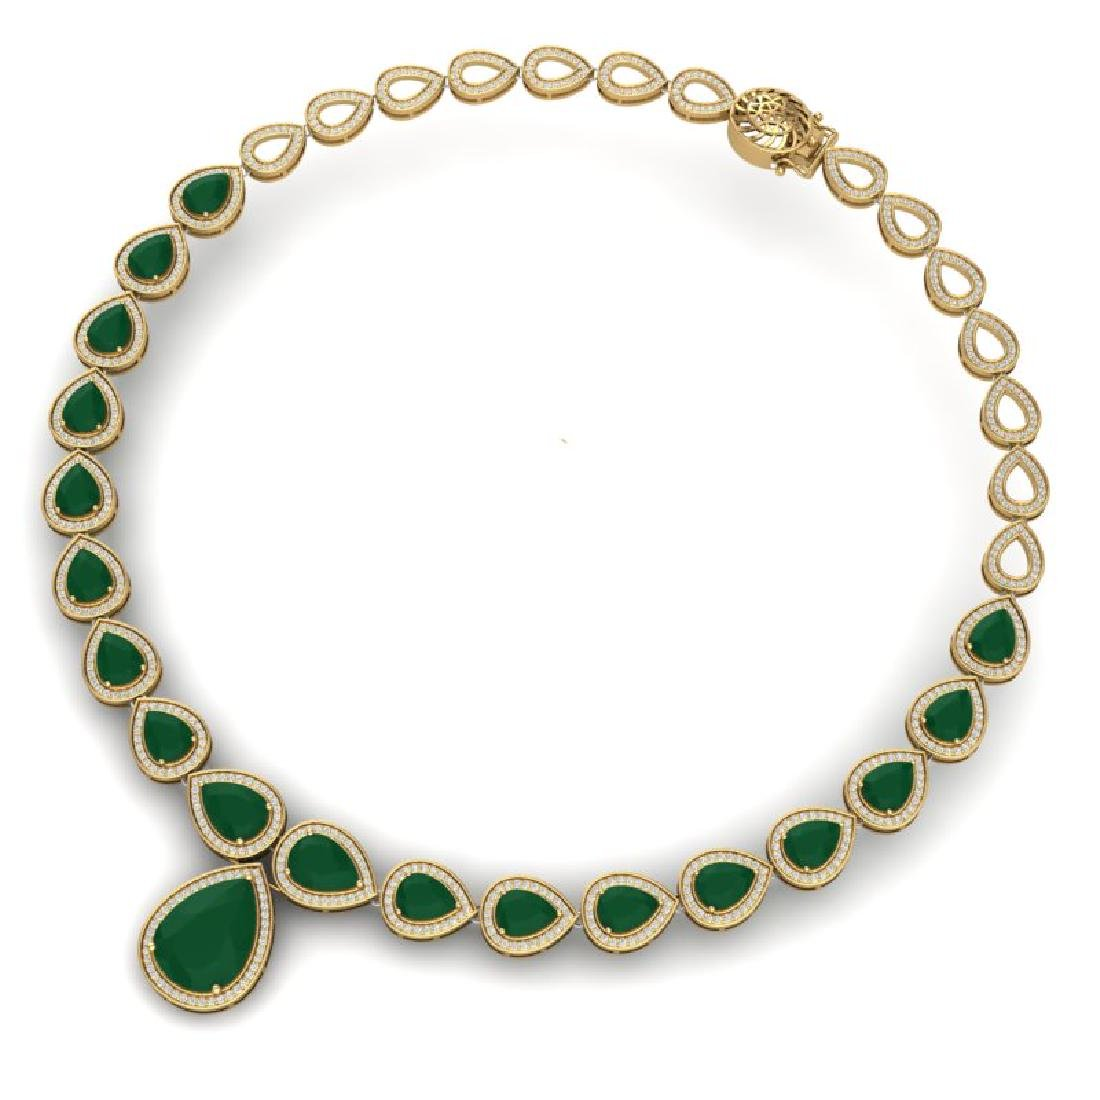 51.41 CTW Royalty Emerald & VS Diamond Necklace 18K - 3